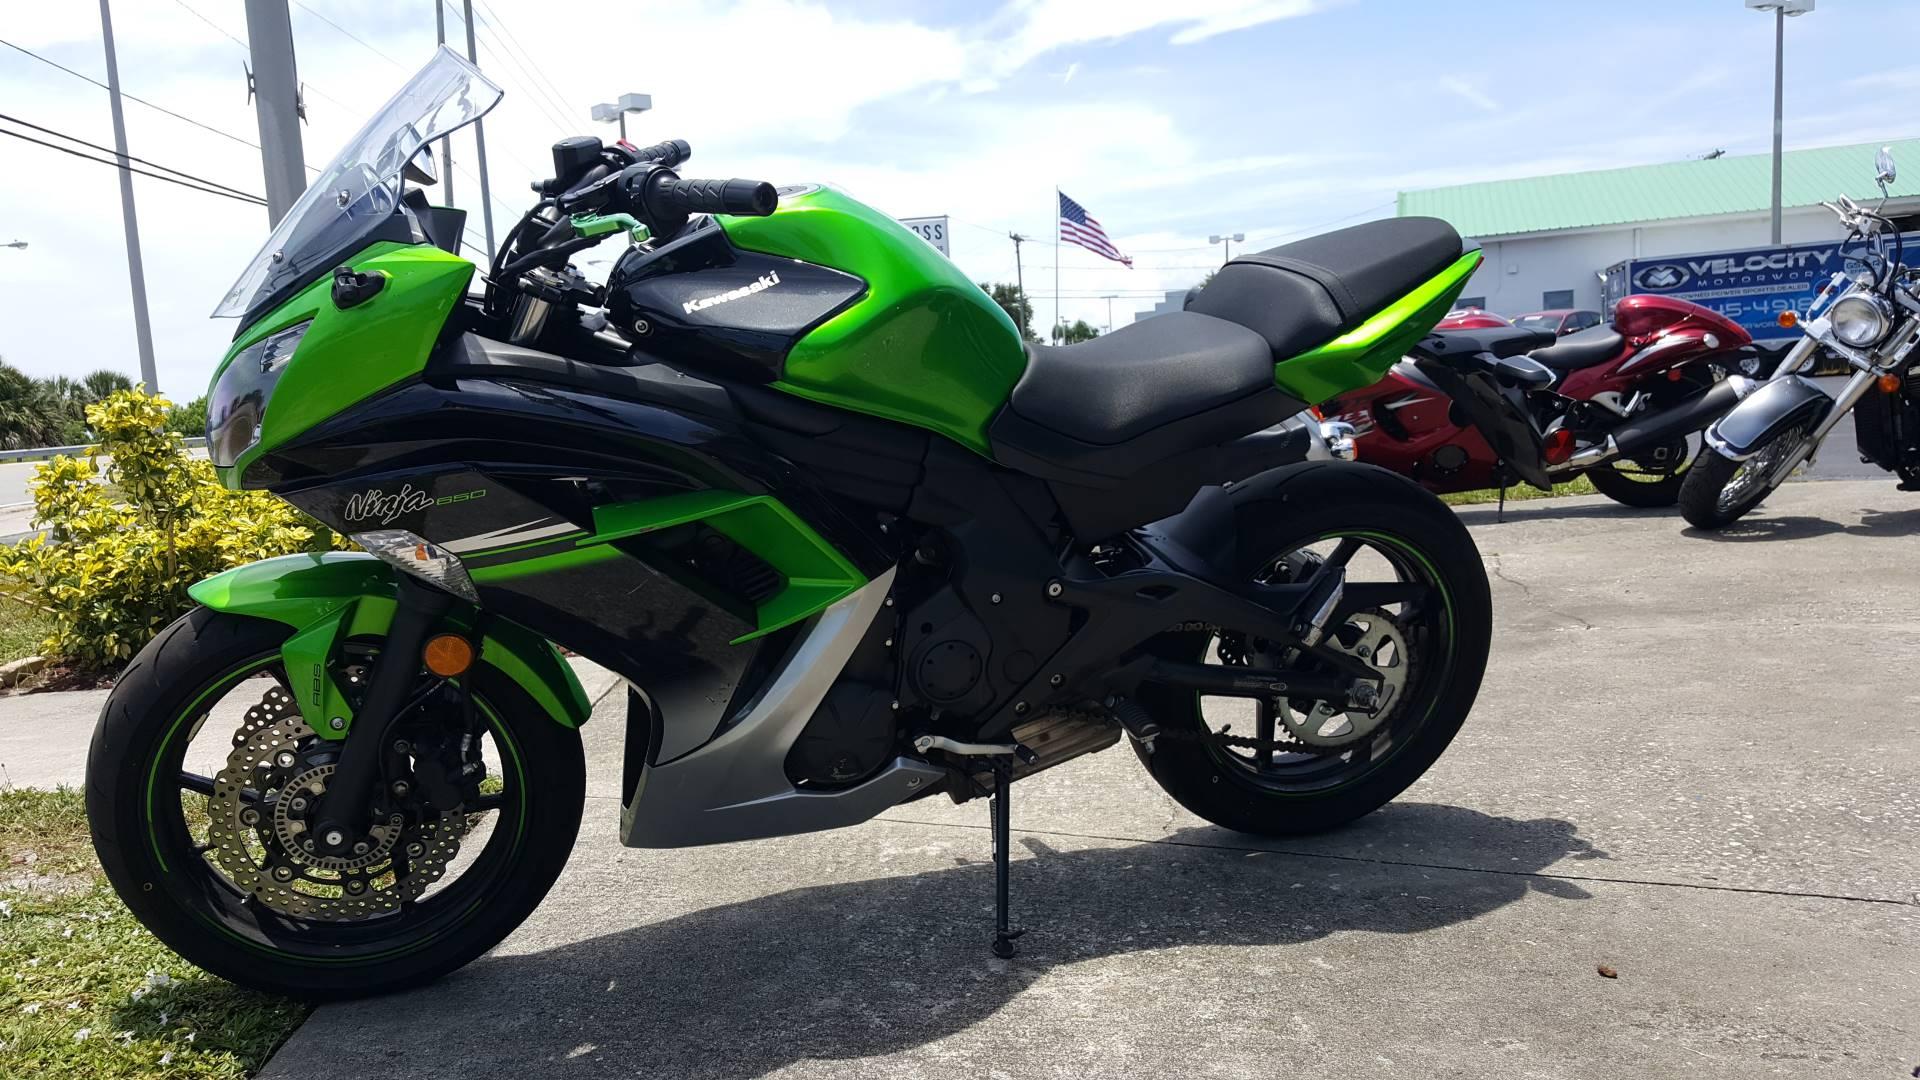 2016 Kawasaki Ninja 650 3